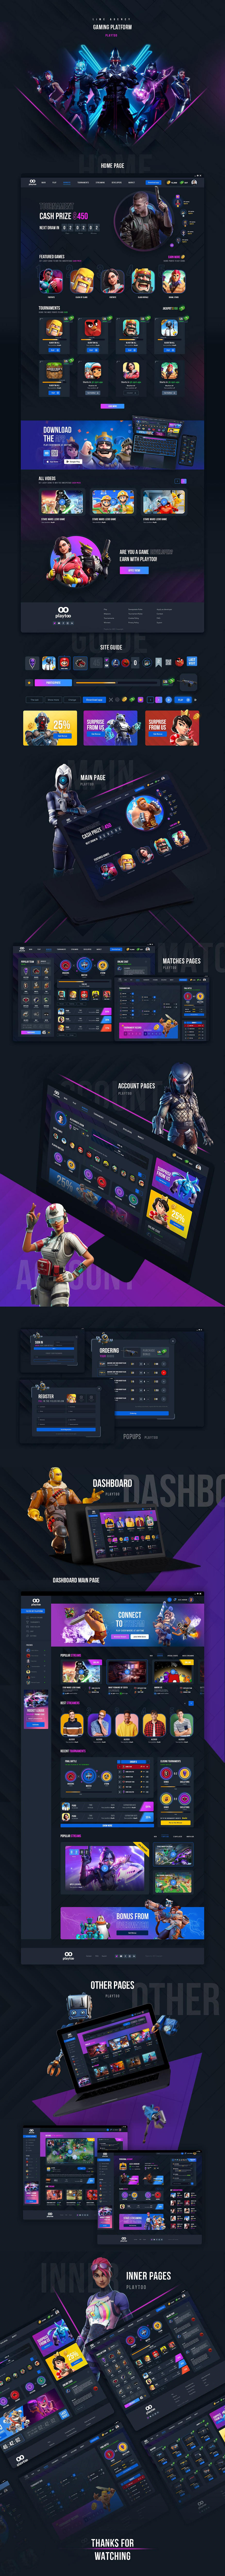 Web Design  wow design brand shop store game UI/UX web site design portal